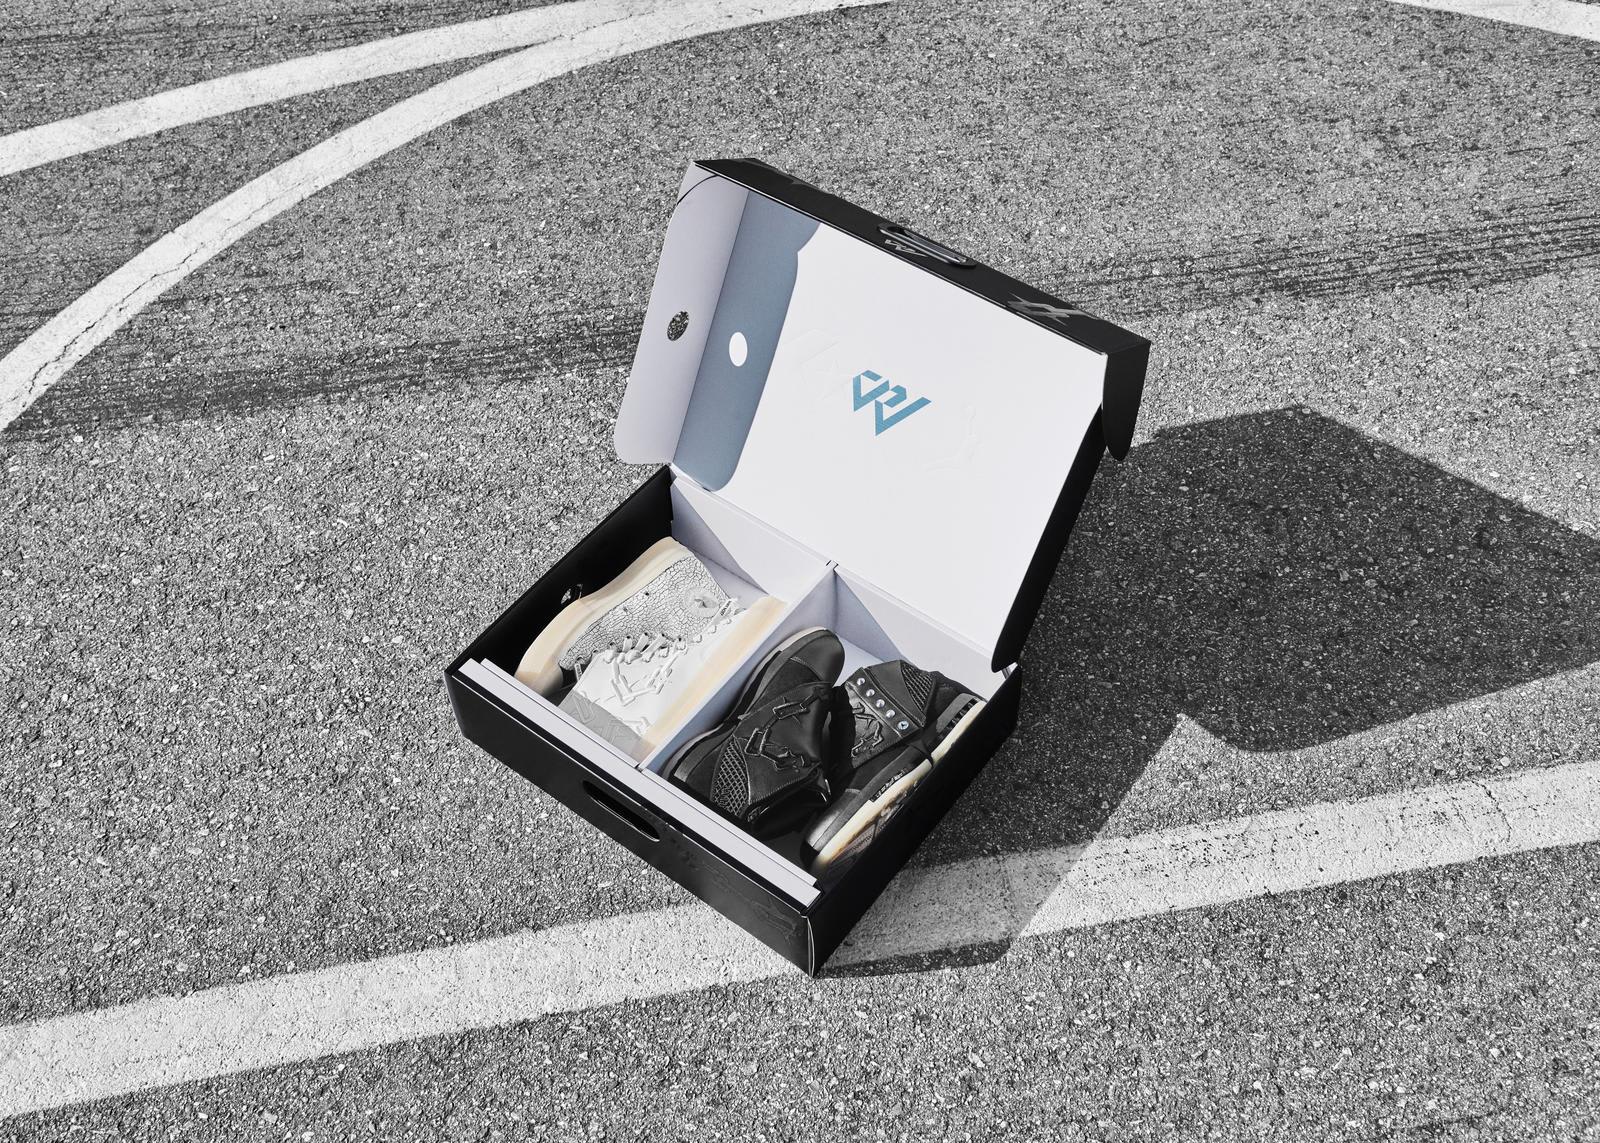 Jordan x Converse 'Why Not?' Pack Box